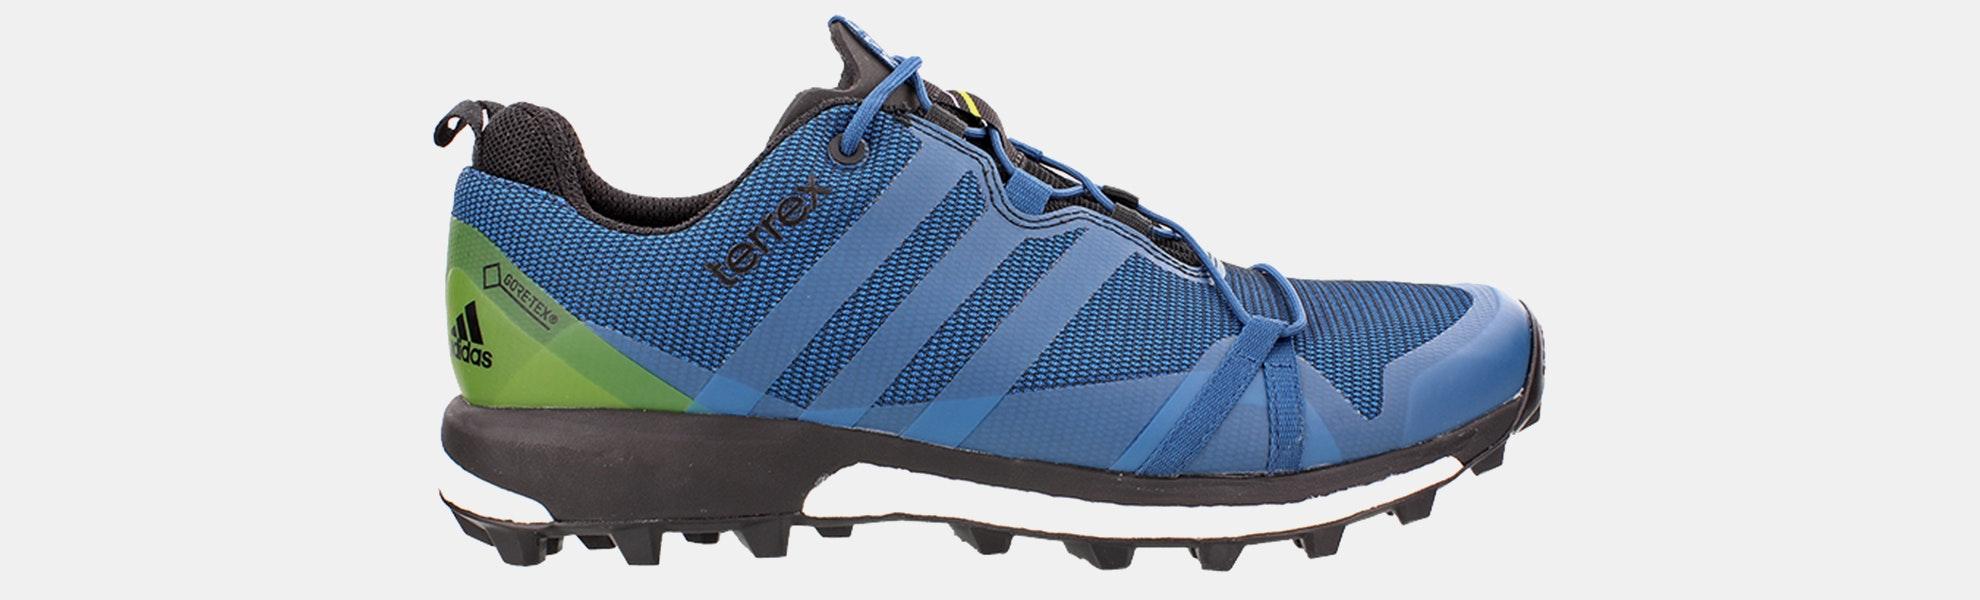 Adidas Terrex Agravic Gore-Tex Shoes